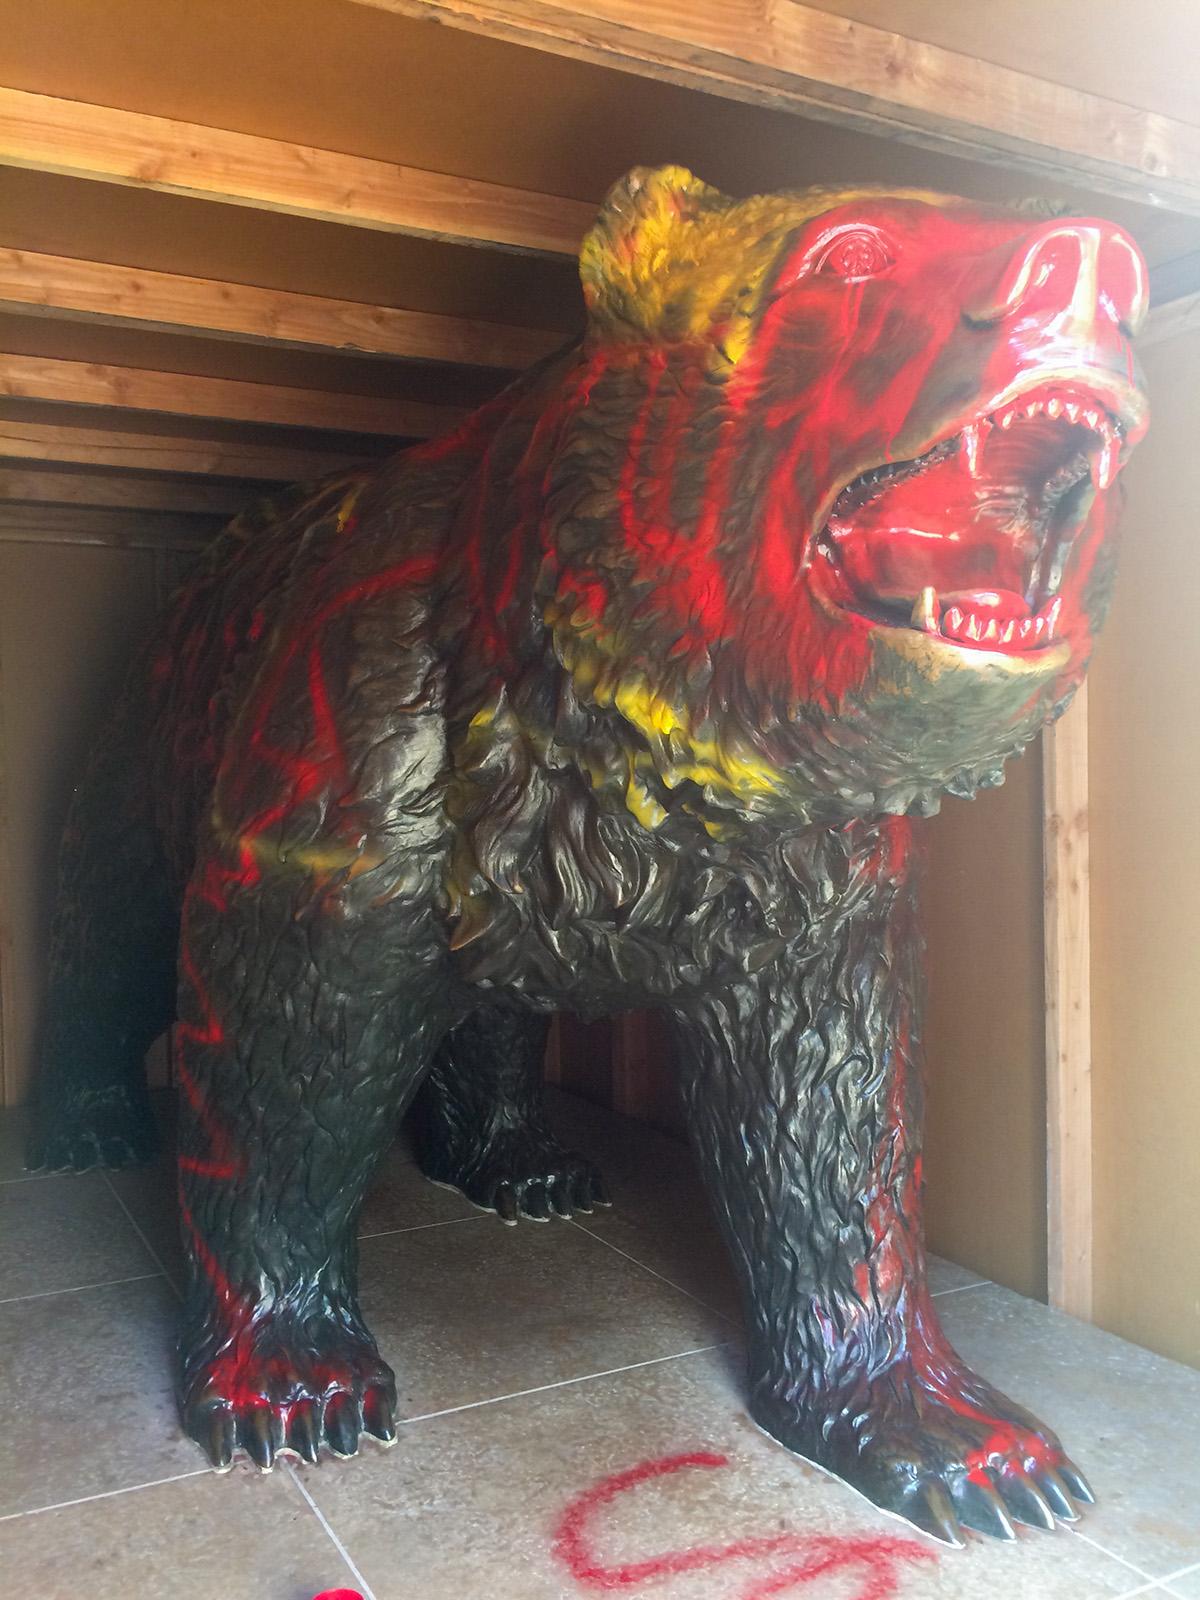 ucla bruin bear found vandalized daily trojan